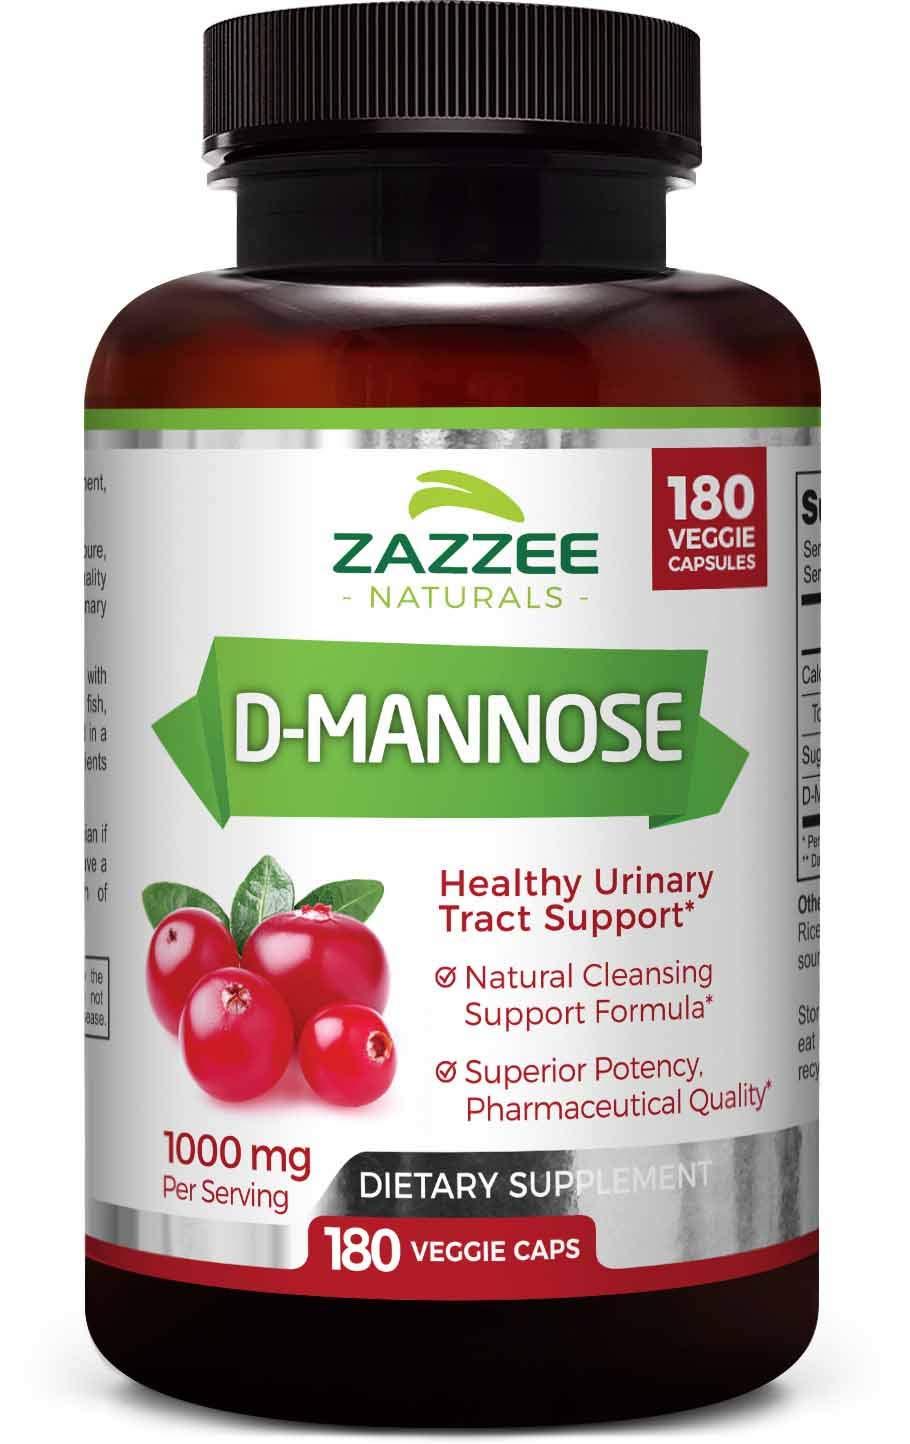 4. Zazzee Naturals D-Mannose Capsules